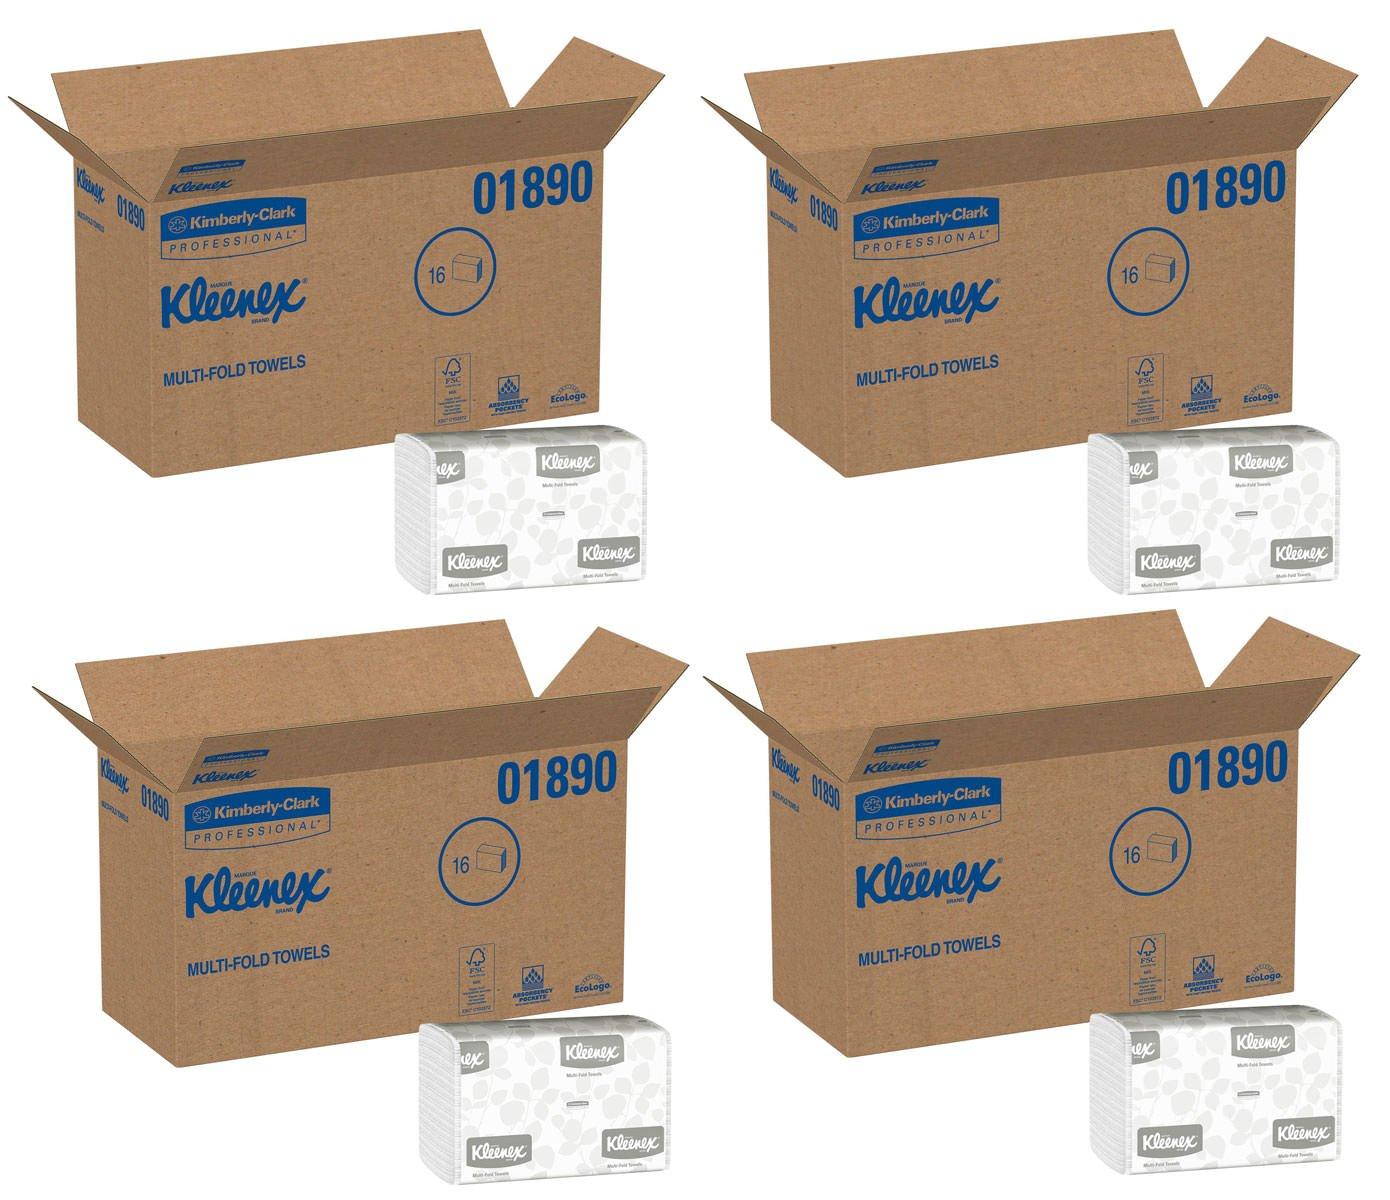 Kleenex Multifold Paper Towels (01890), White, Case of 64 Packs fdVsMO, 150 Tri Fold Paper Towels per Pack